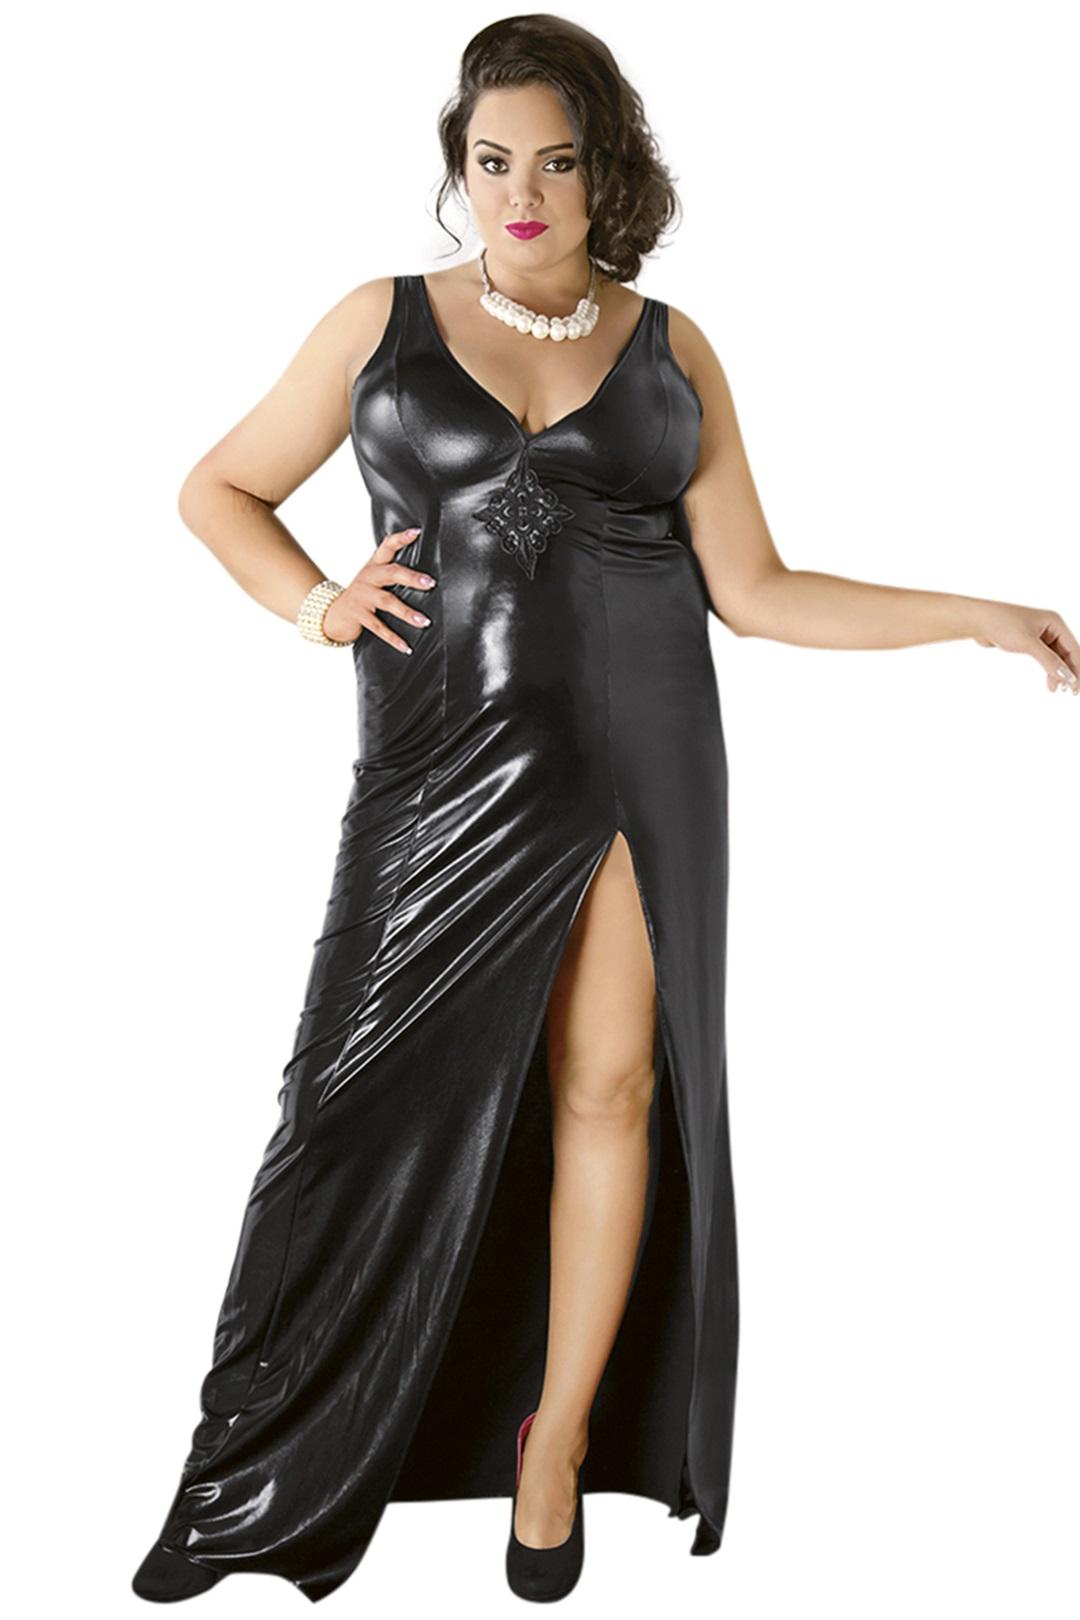 C/4005 Langes schwarzes Wetlook-Kleid von Andalea Dessous ...